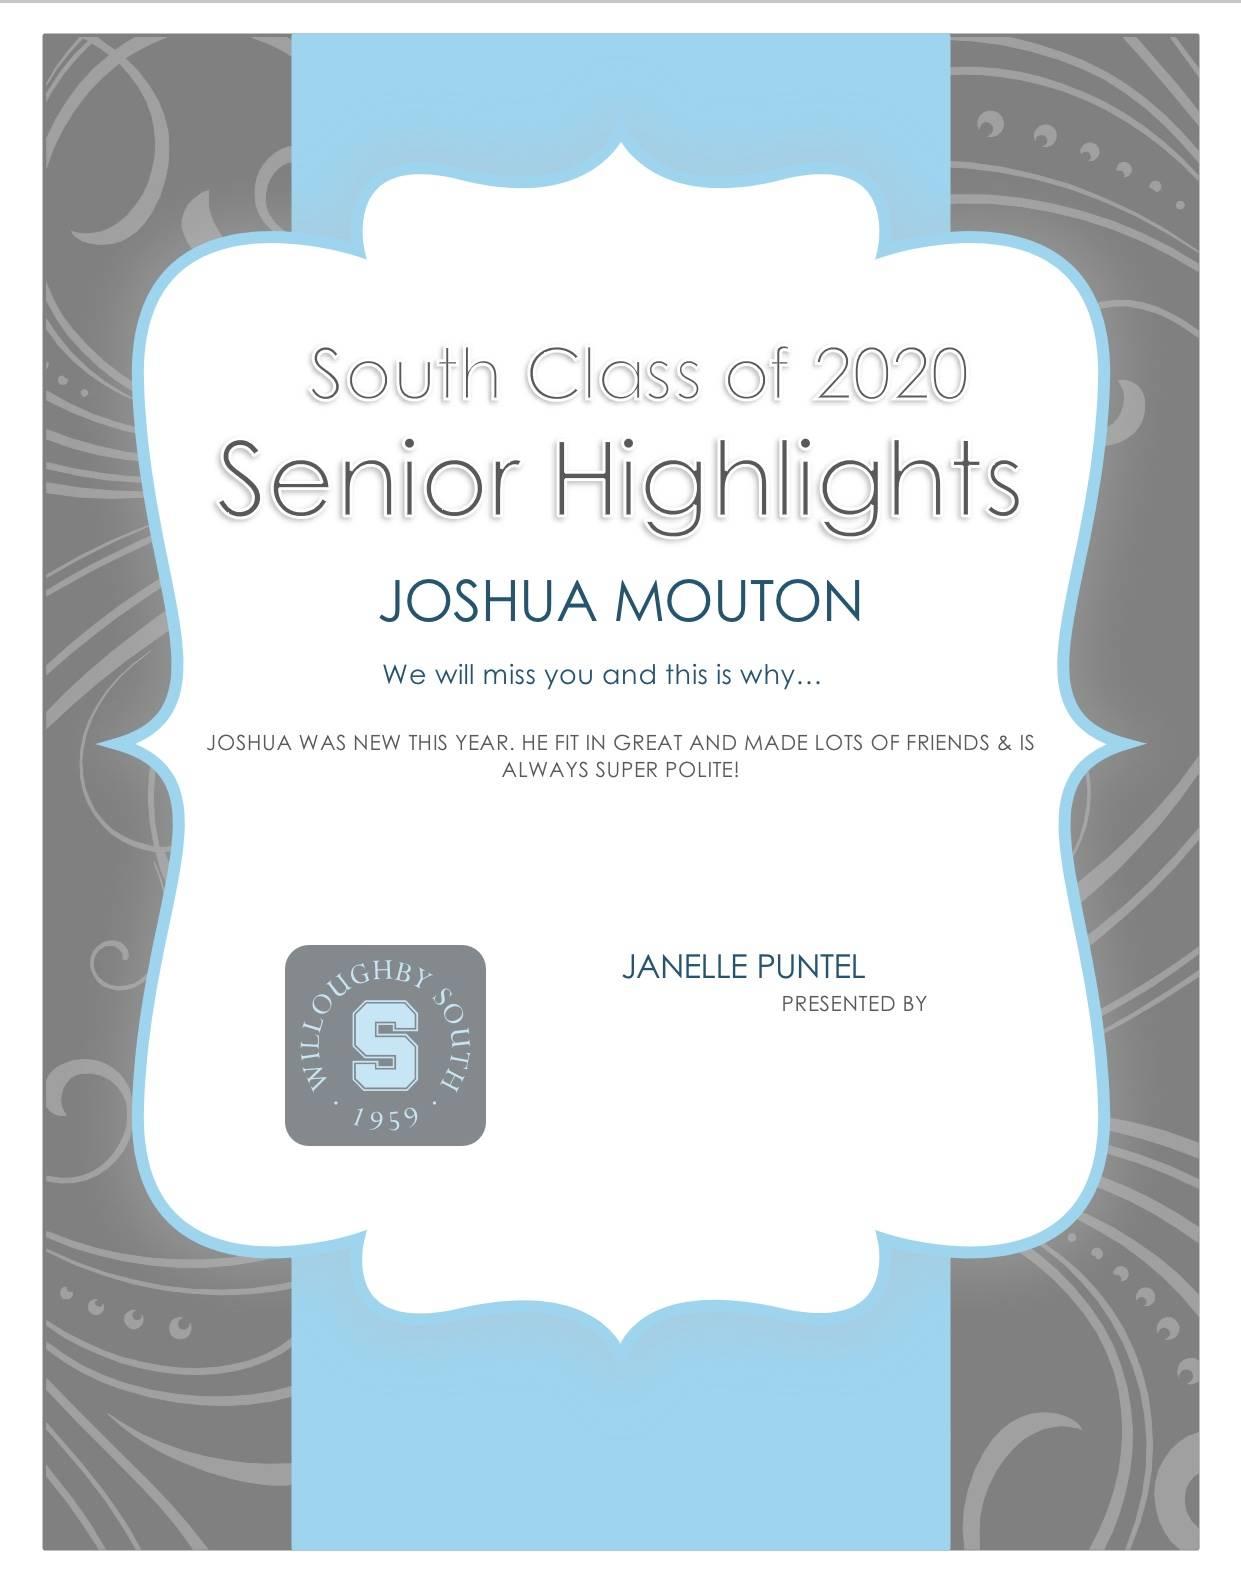 Joshua Mouton